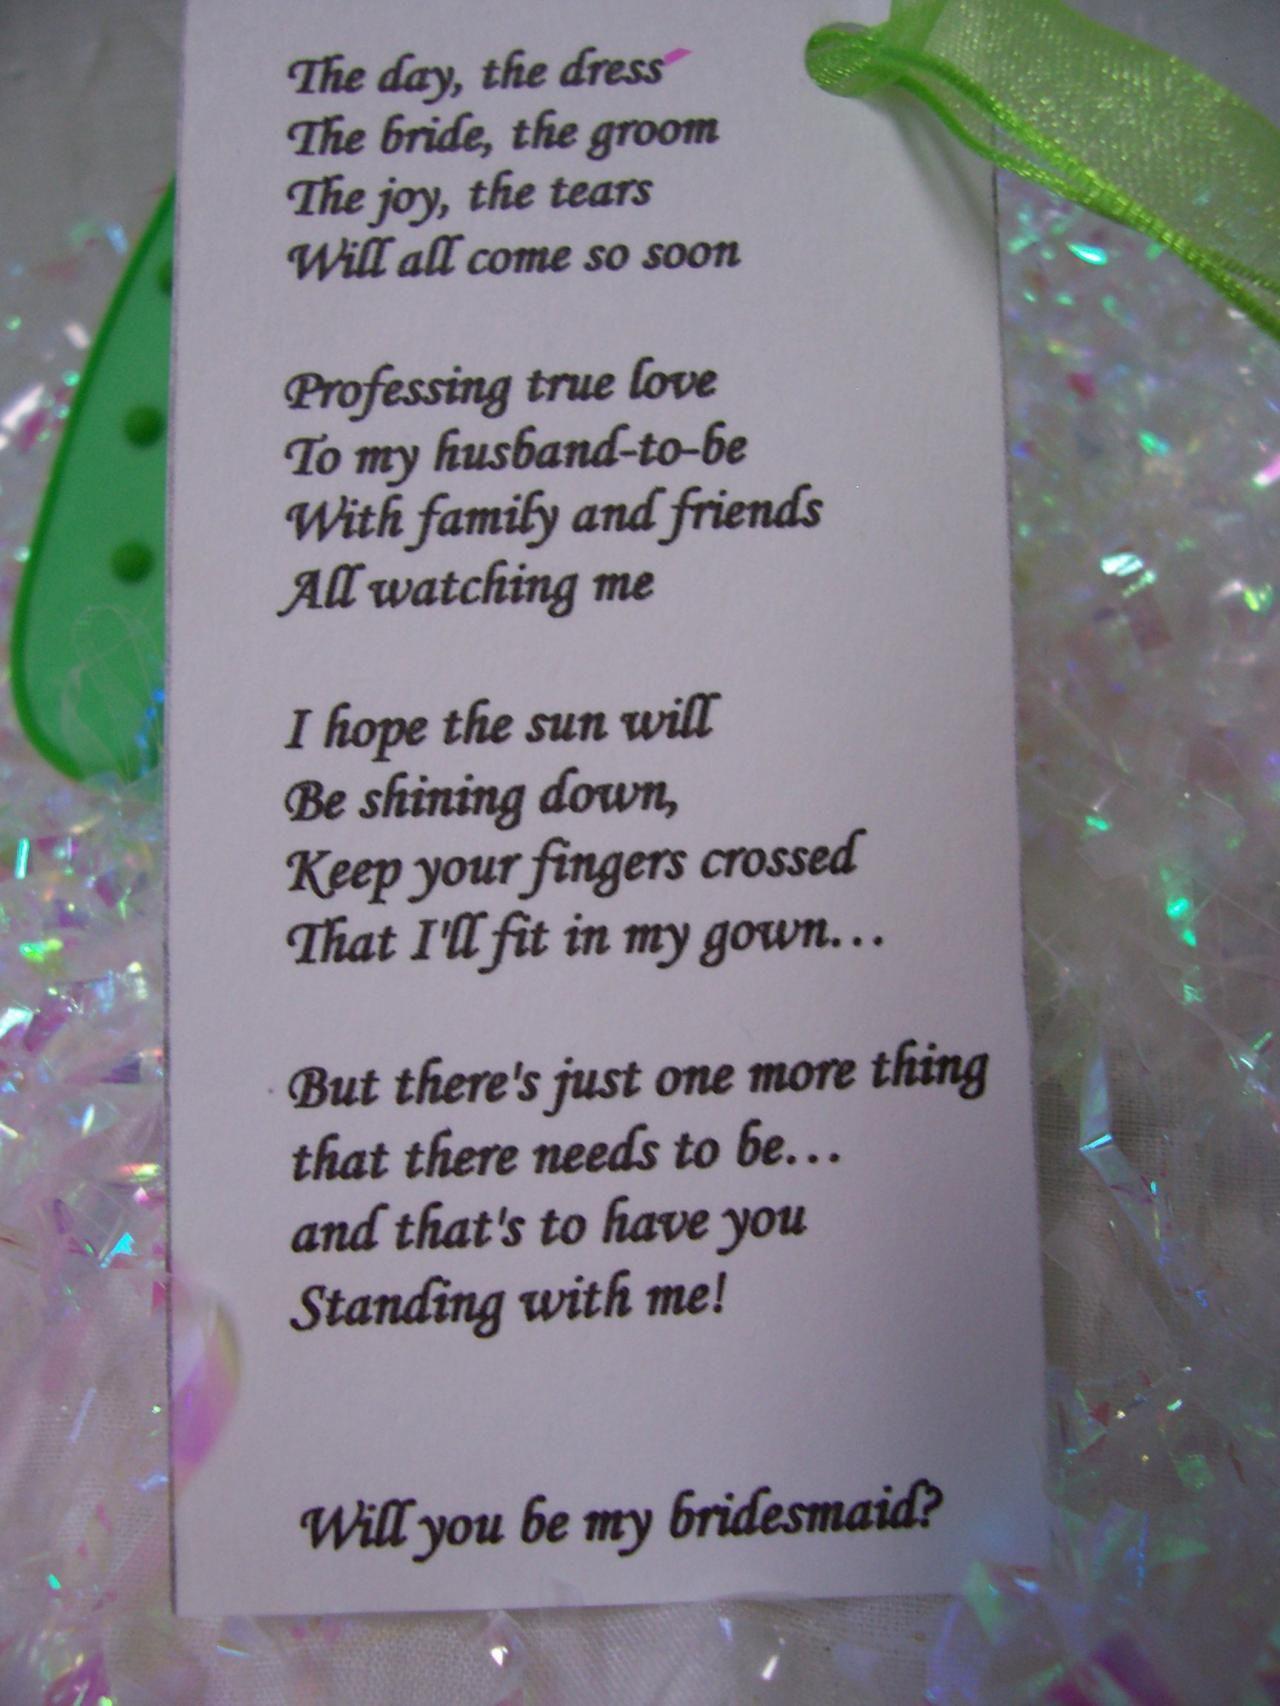 Cute will you be my bridesmaid poem bridesmaid poems